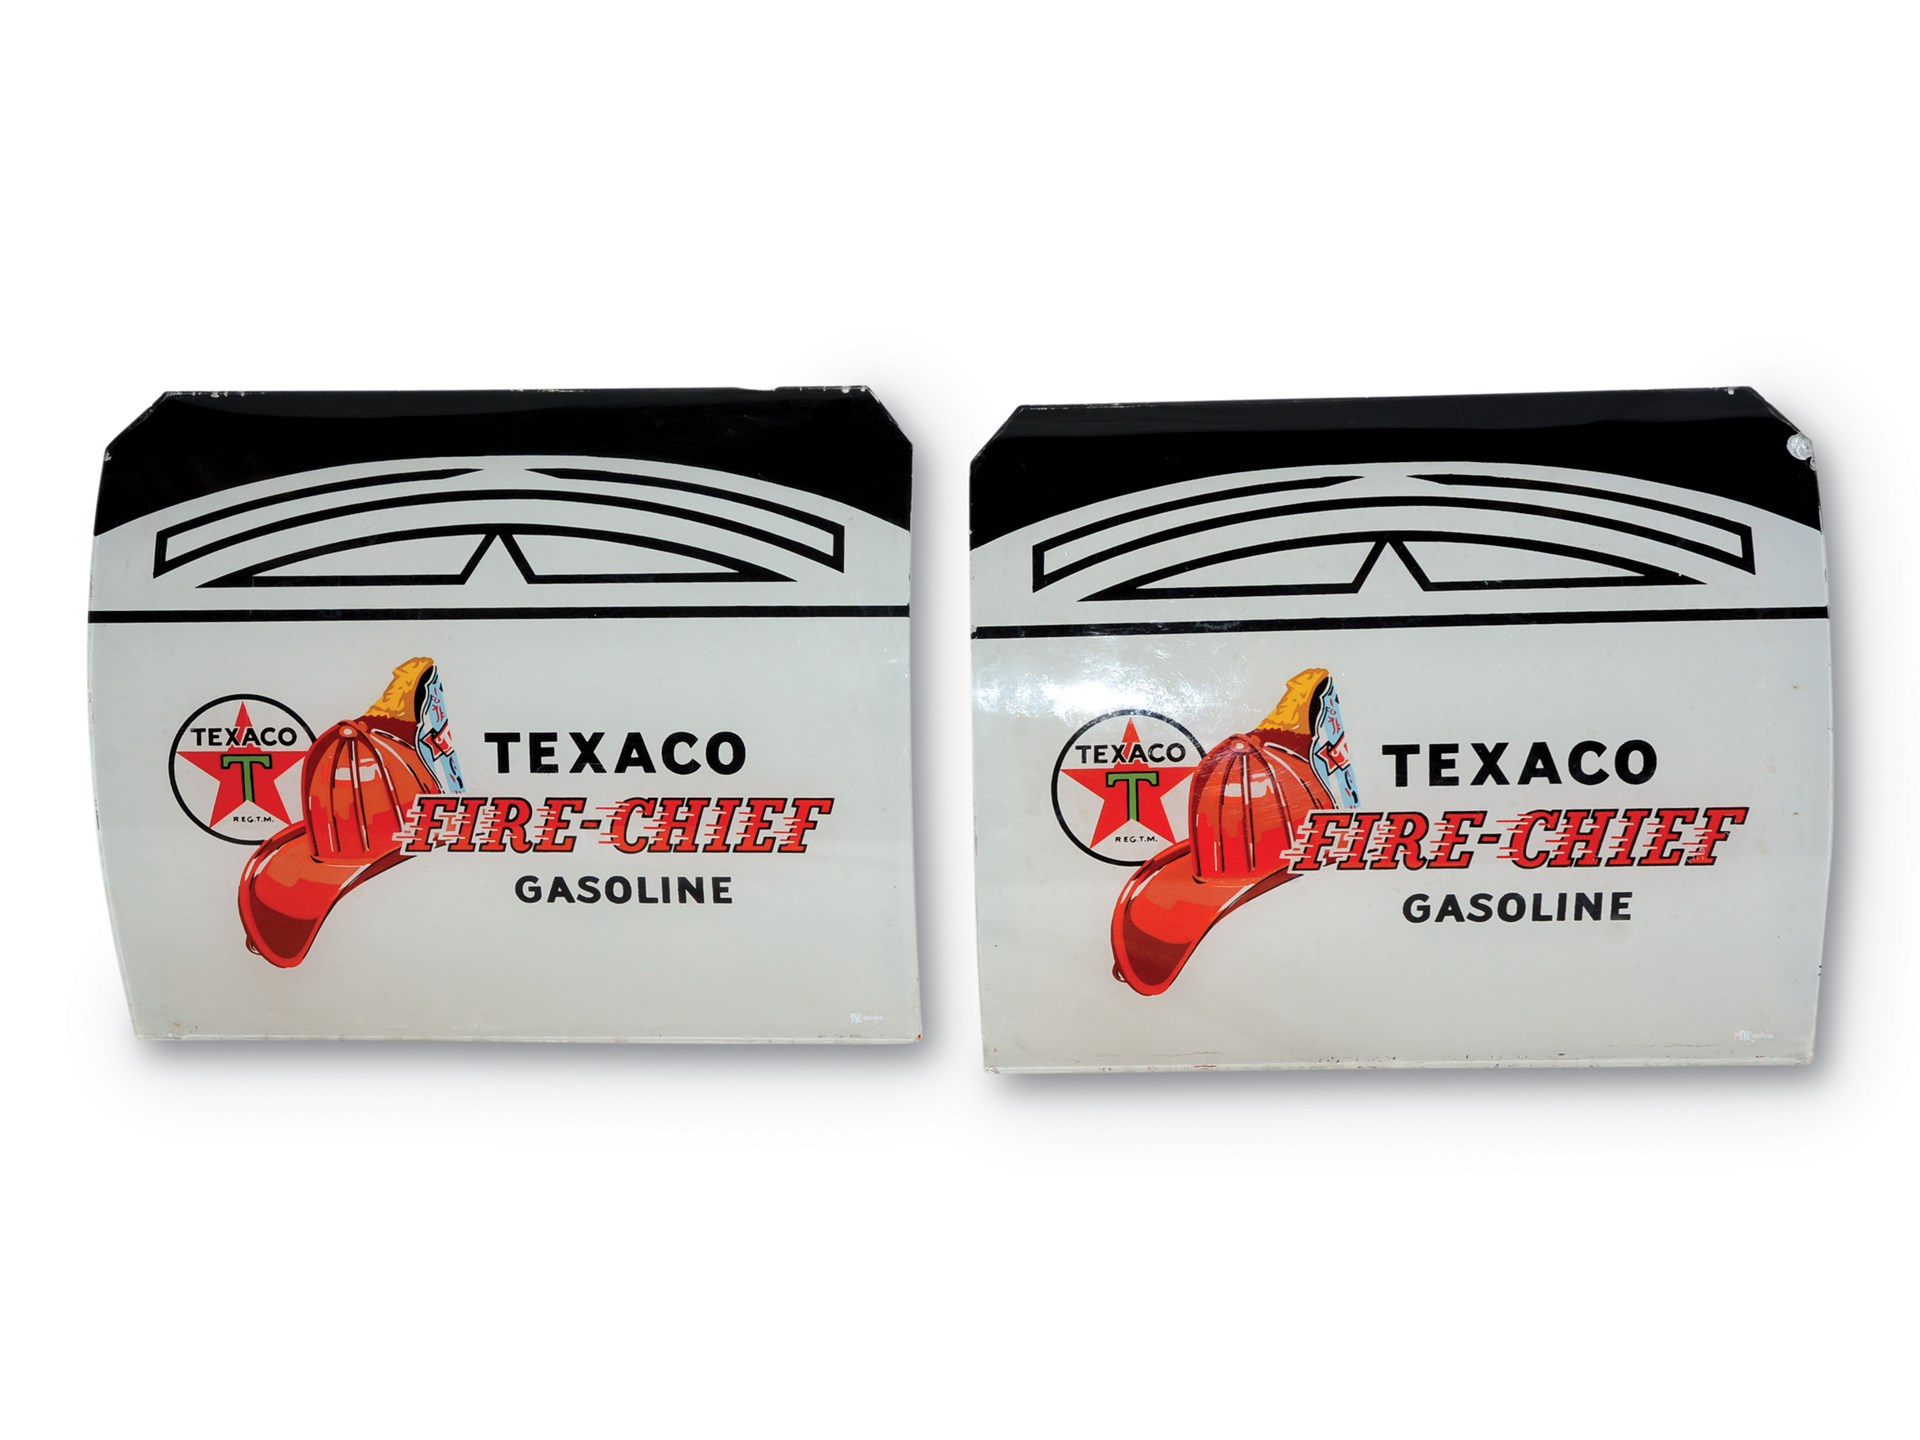 RM Sotheby's - Pair of Original Texaco Fire-Chief Gasoline Ad